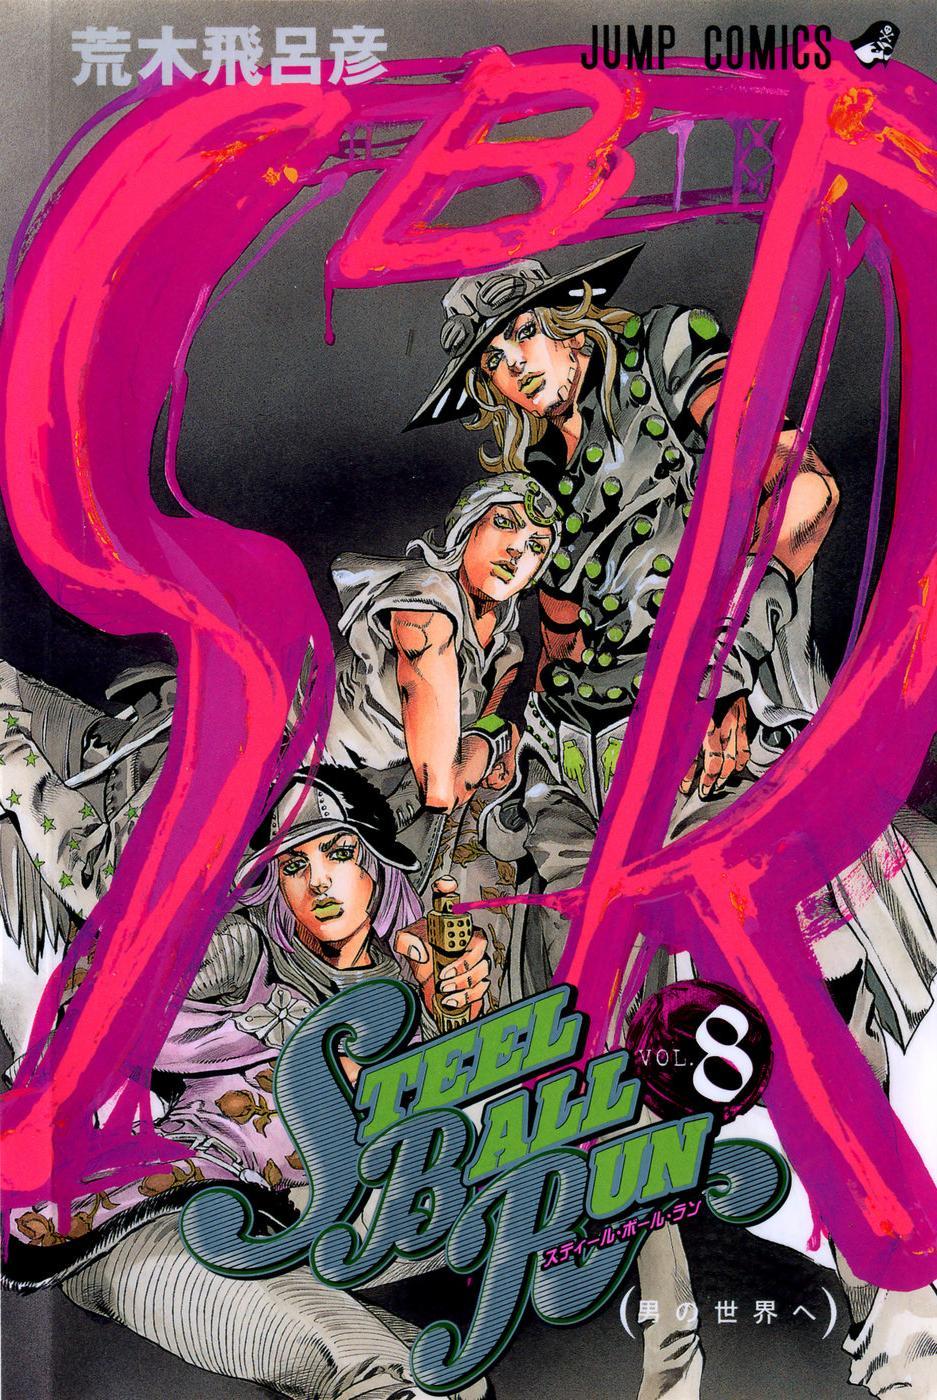 SBR Volumen 8